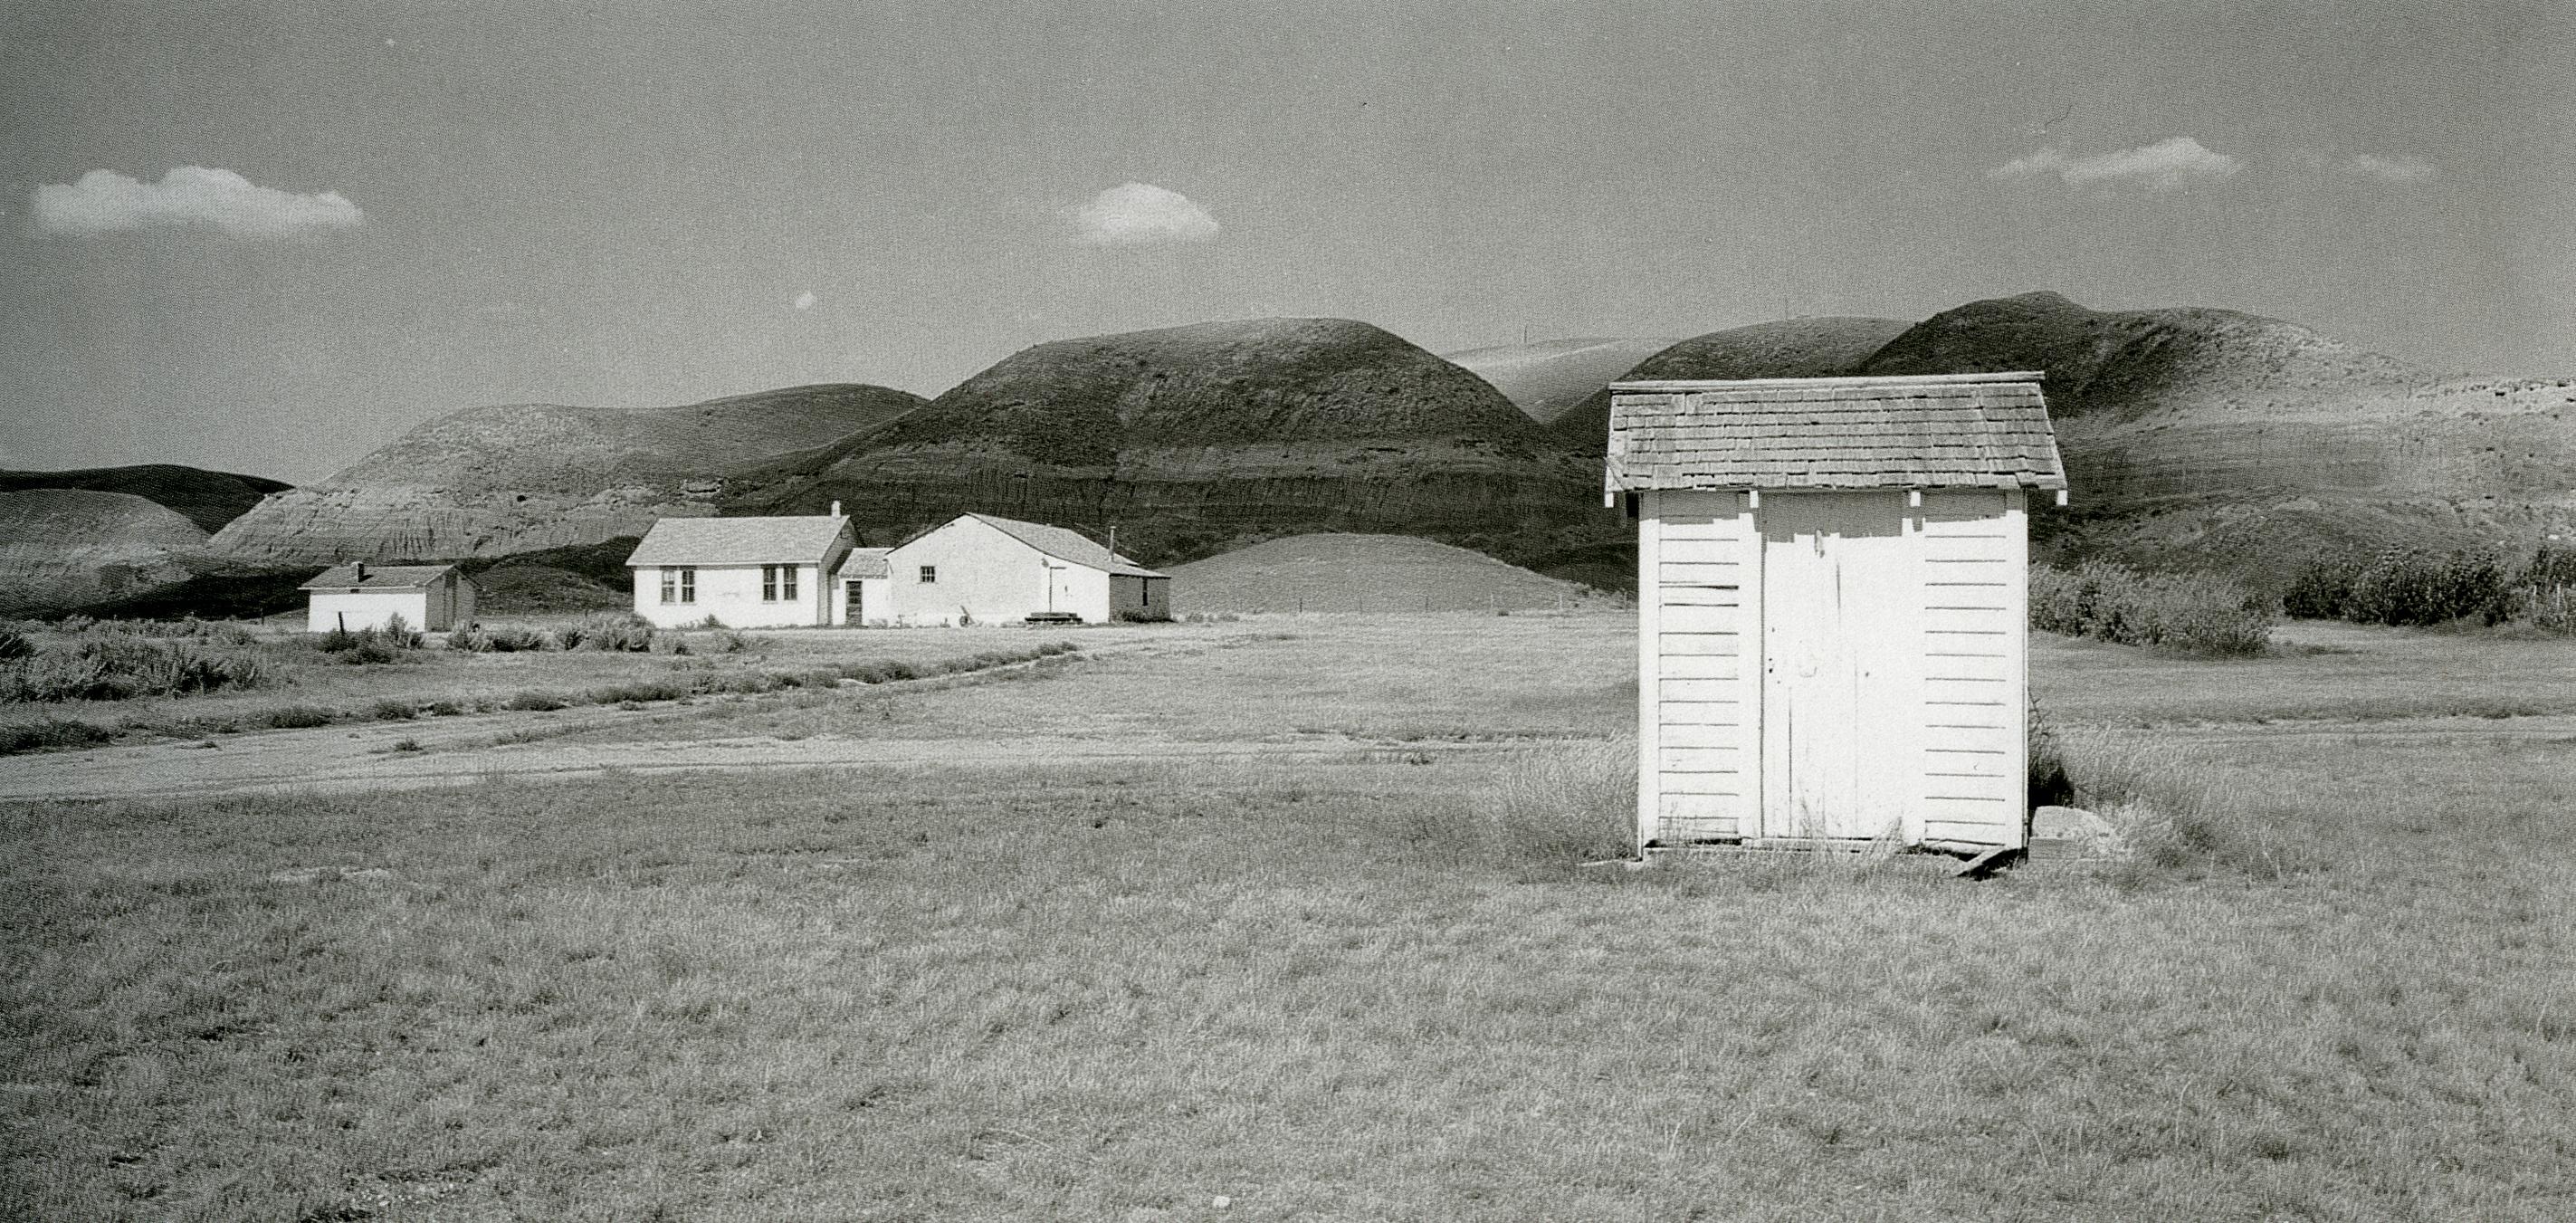 orest semchishen_salle communautaire, Dorothy, AB_1989